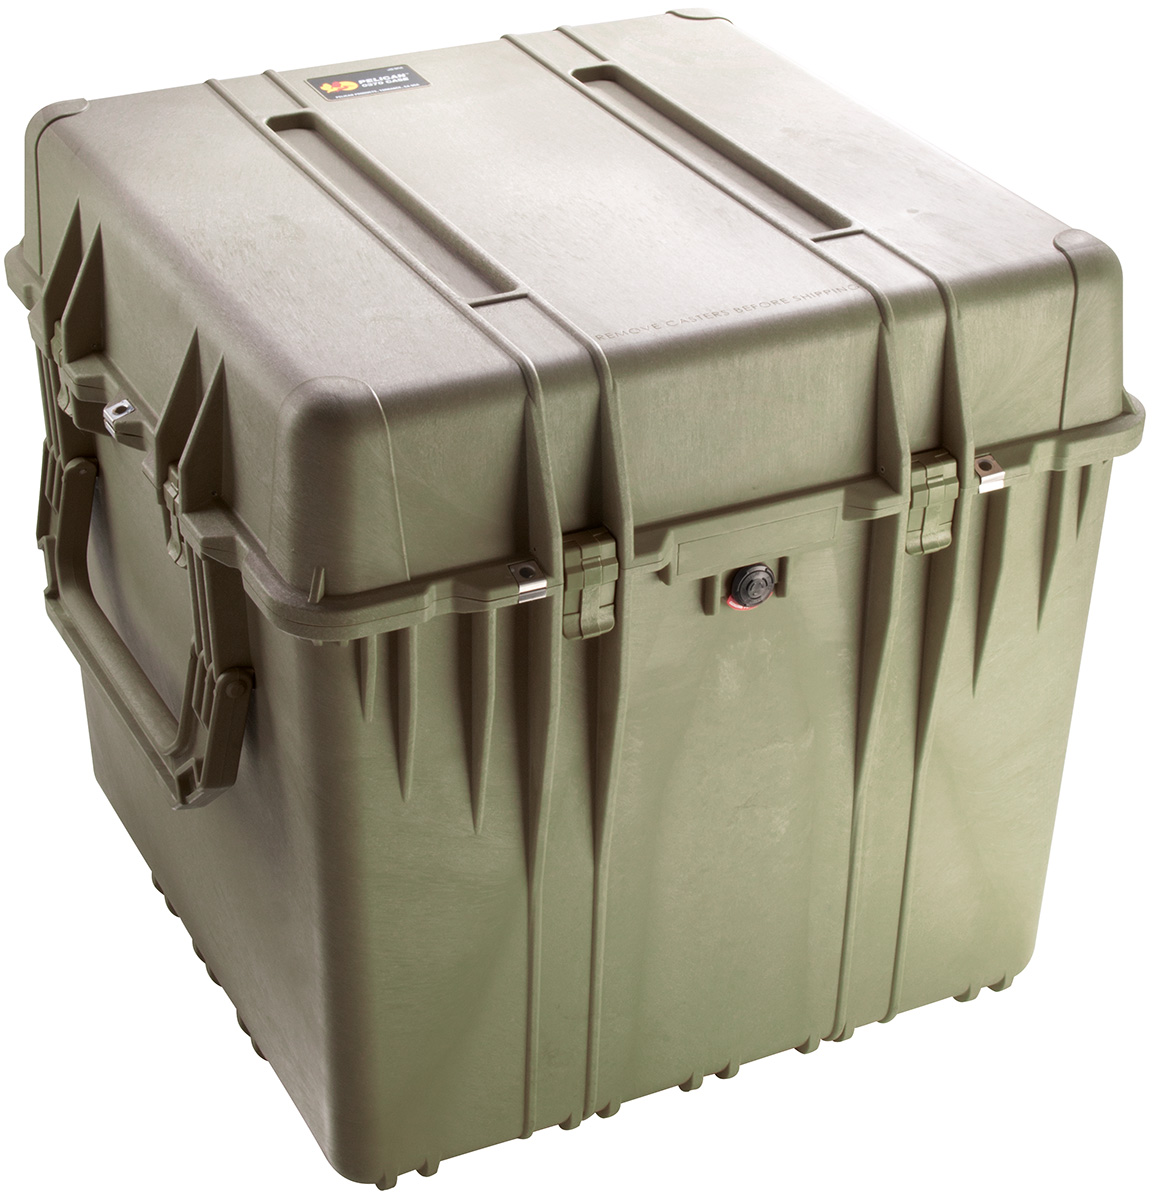 pelican peli products 0370 large box hard transport case